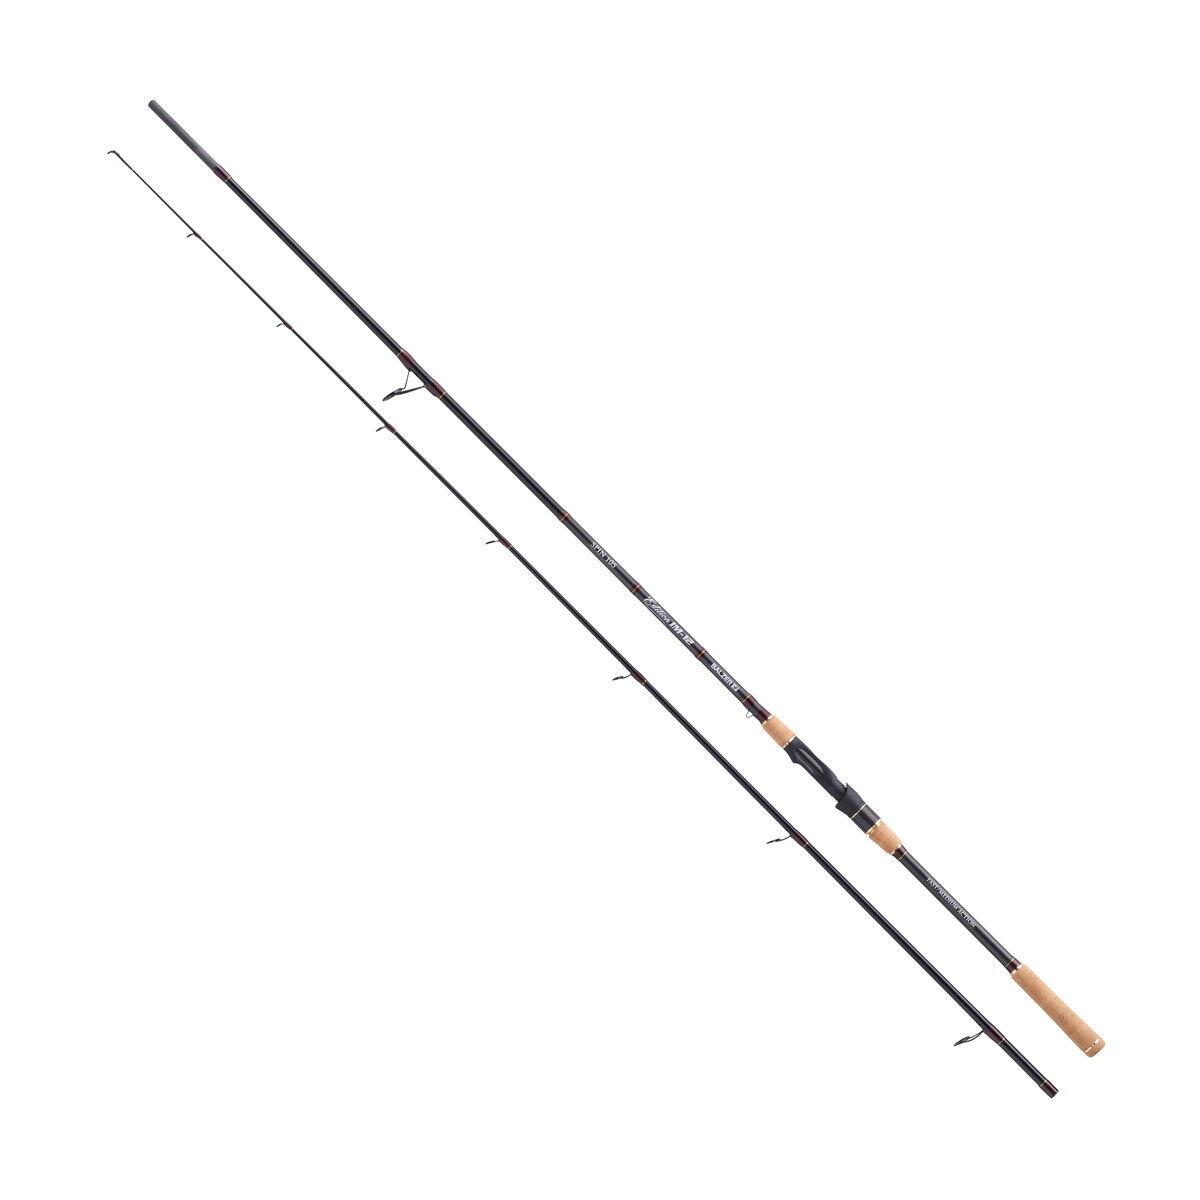 Balzer Edition im-12 Steck modello 2016 SPIN 105 2,85m steckrute SPIN